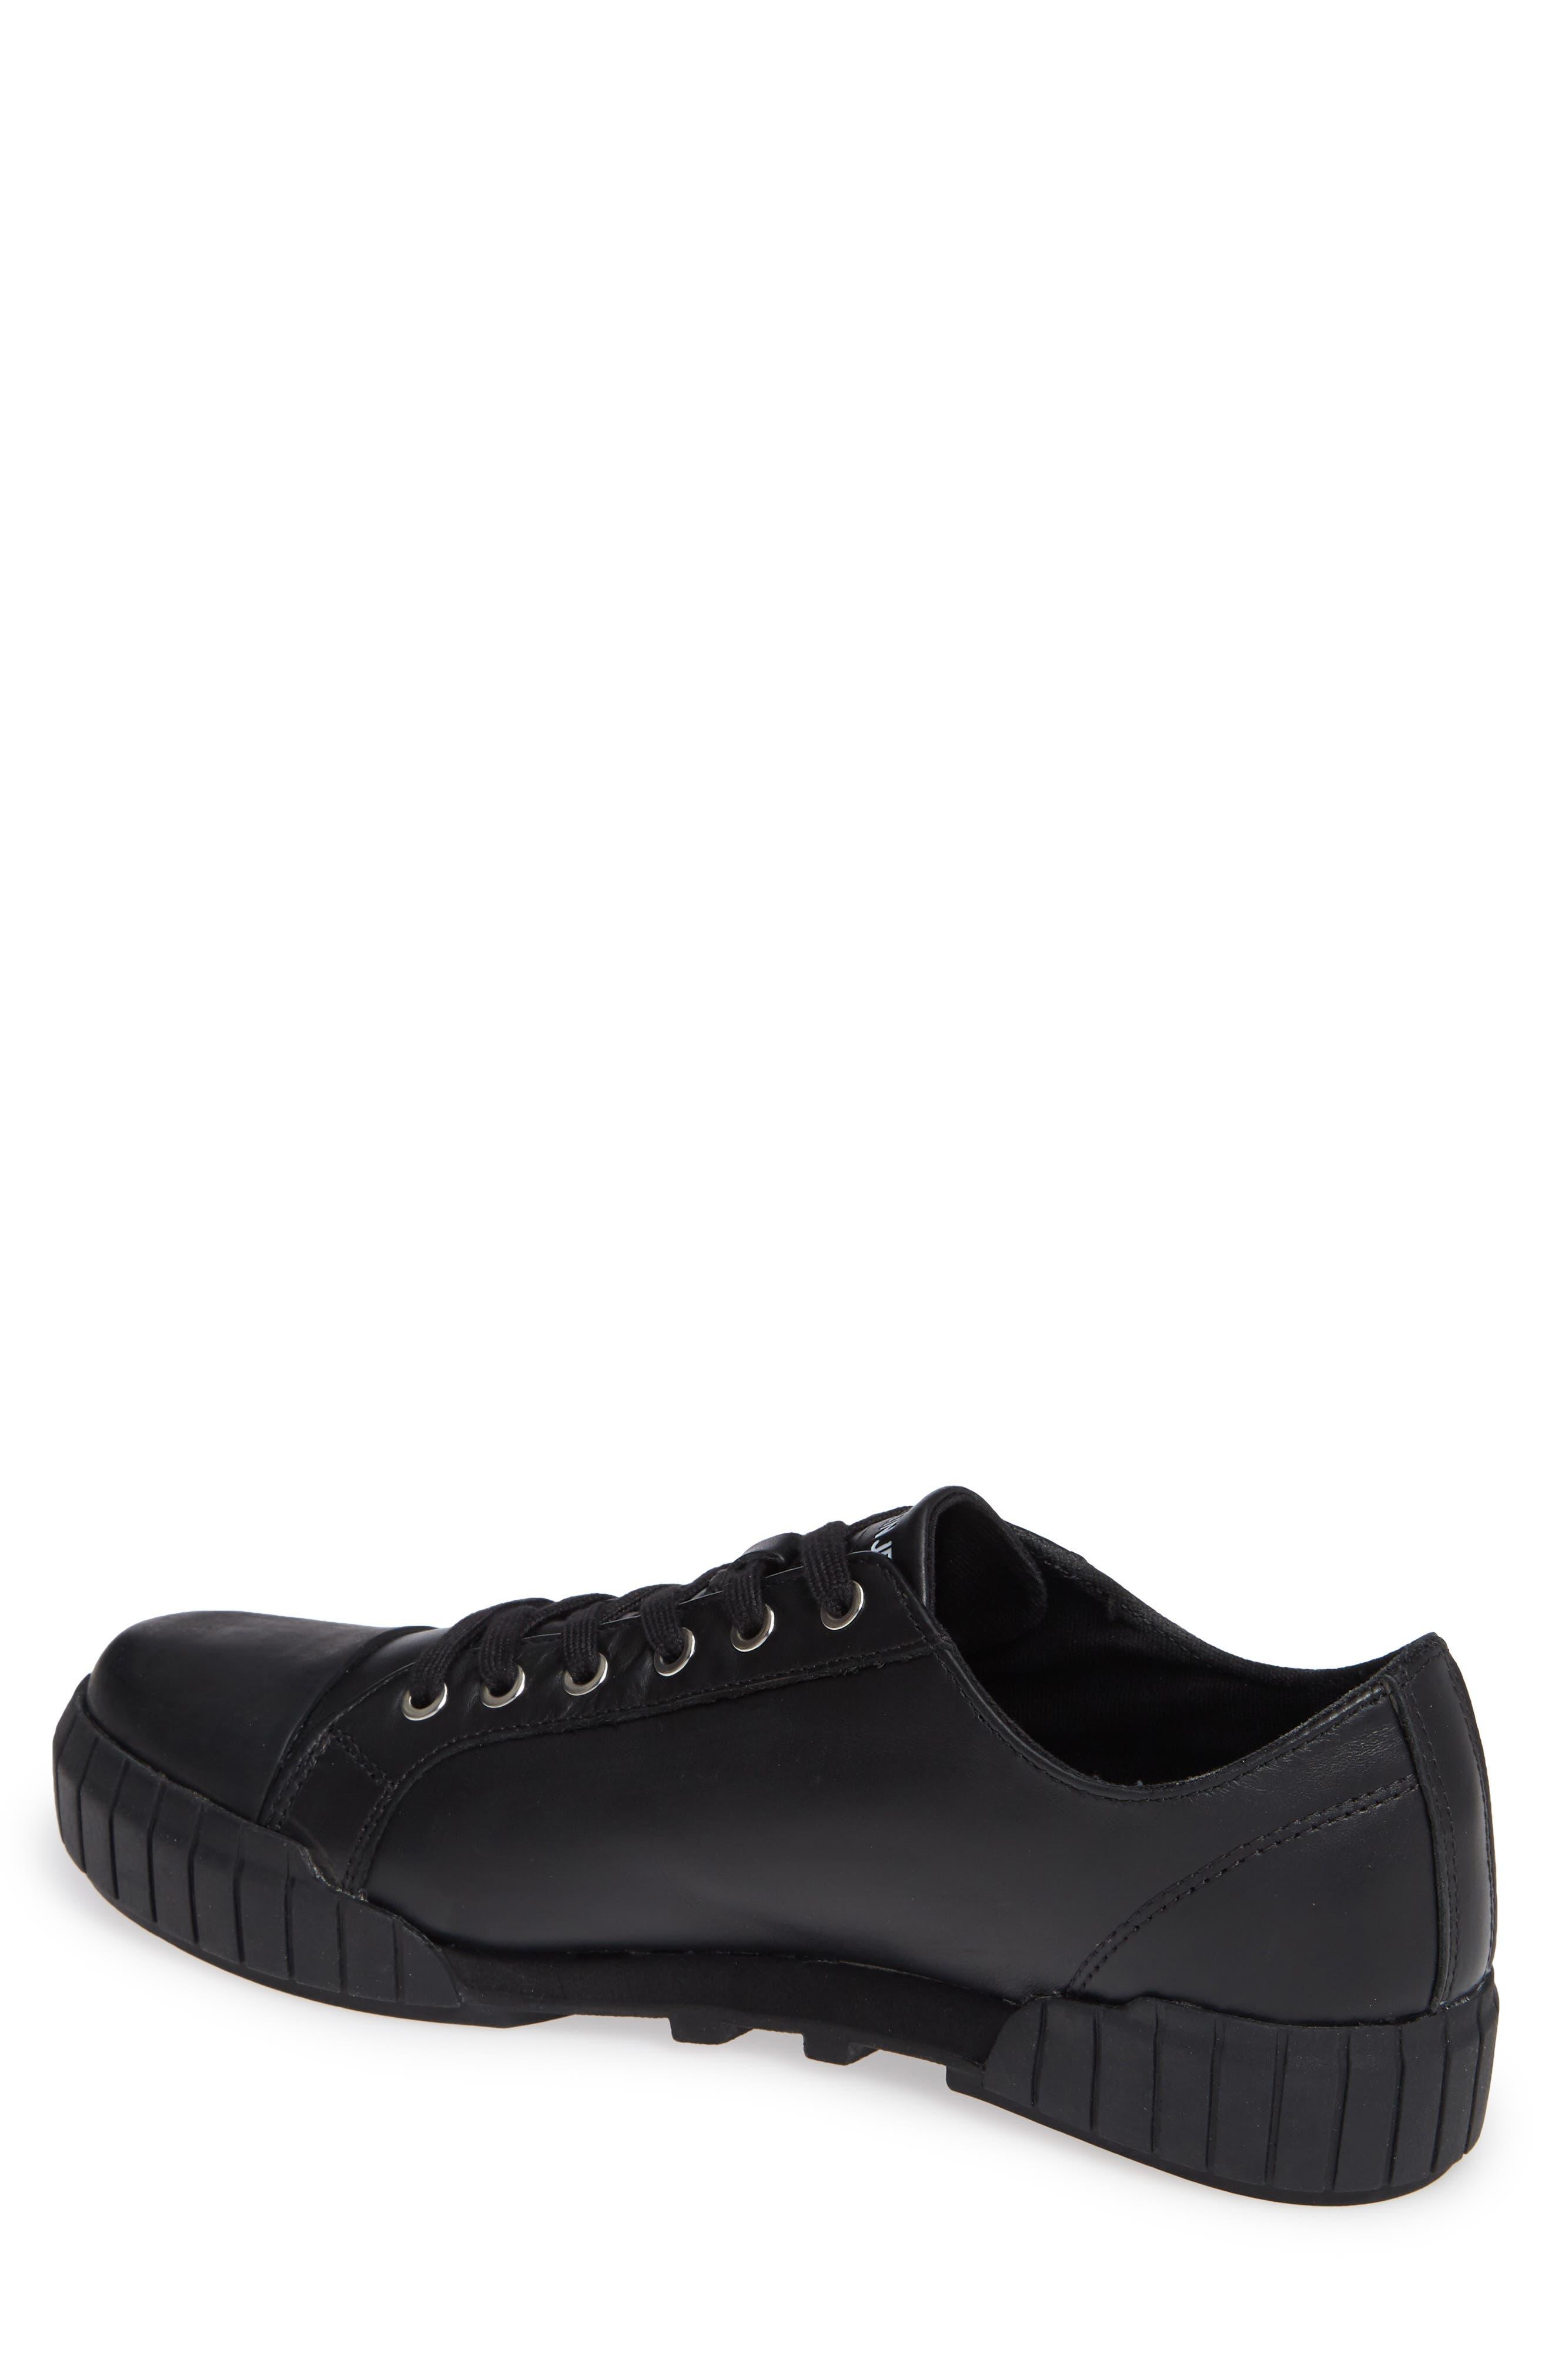 Burton Sneaker,                             Alternate thumbnail 2, color,                             001